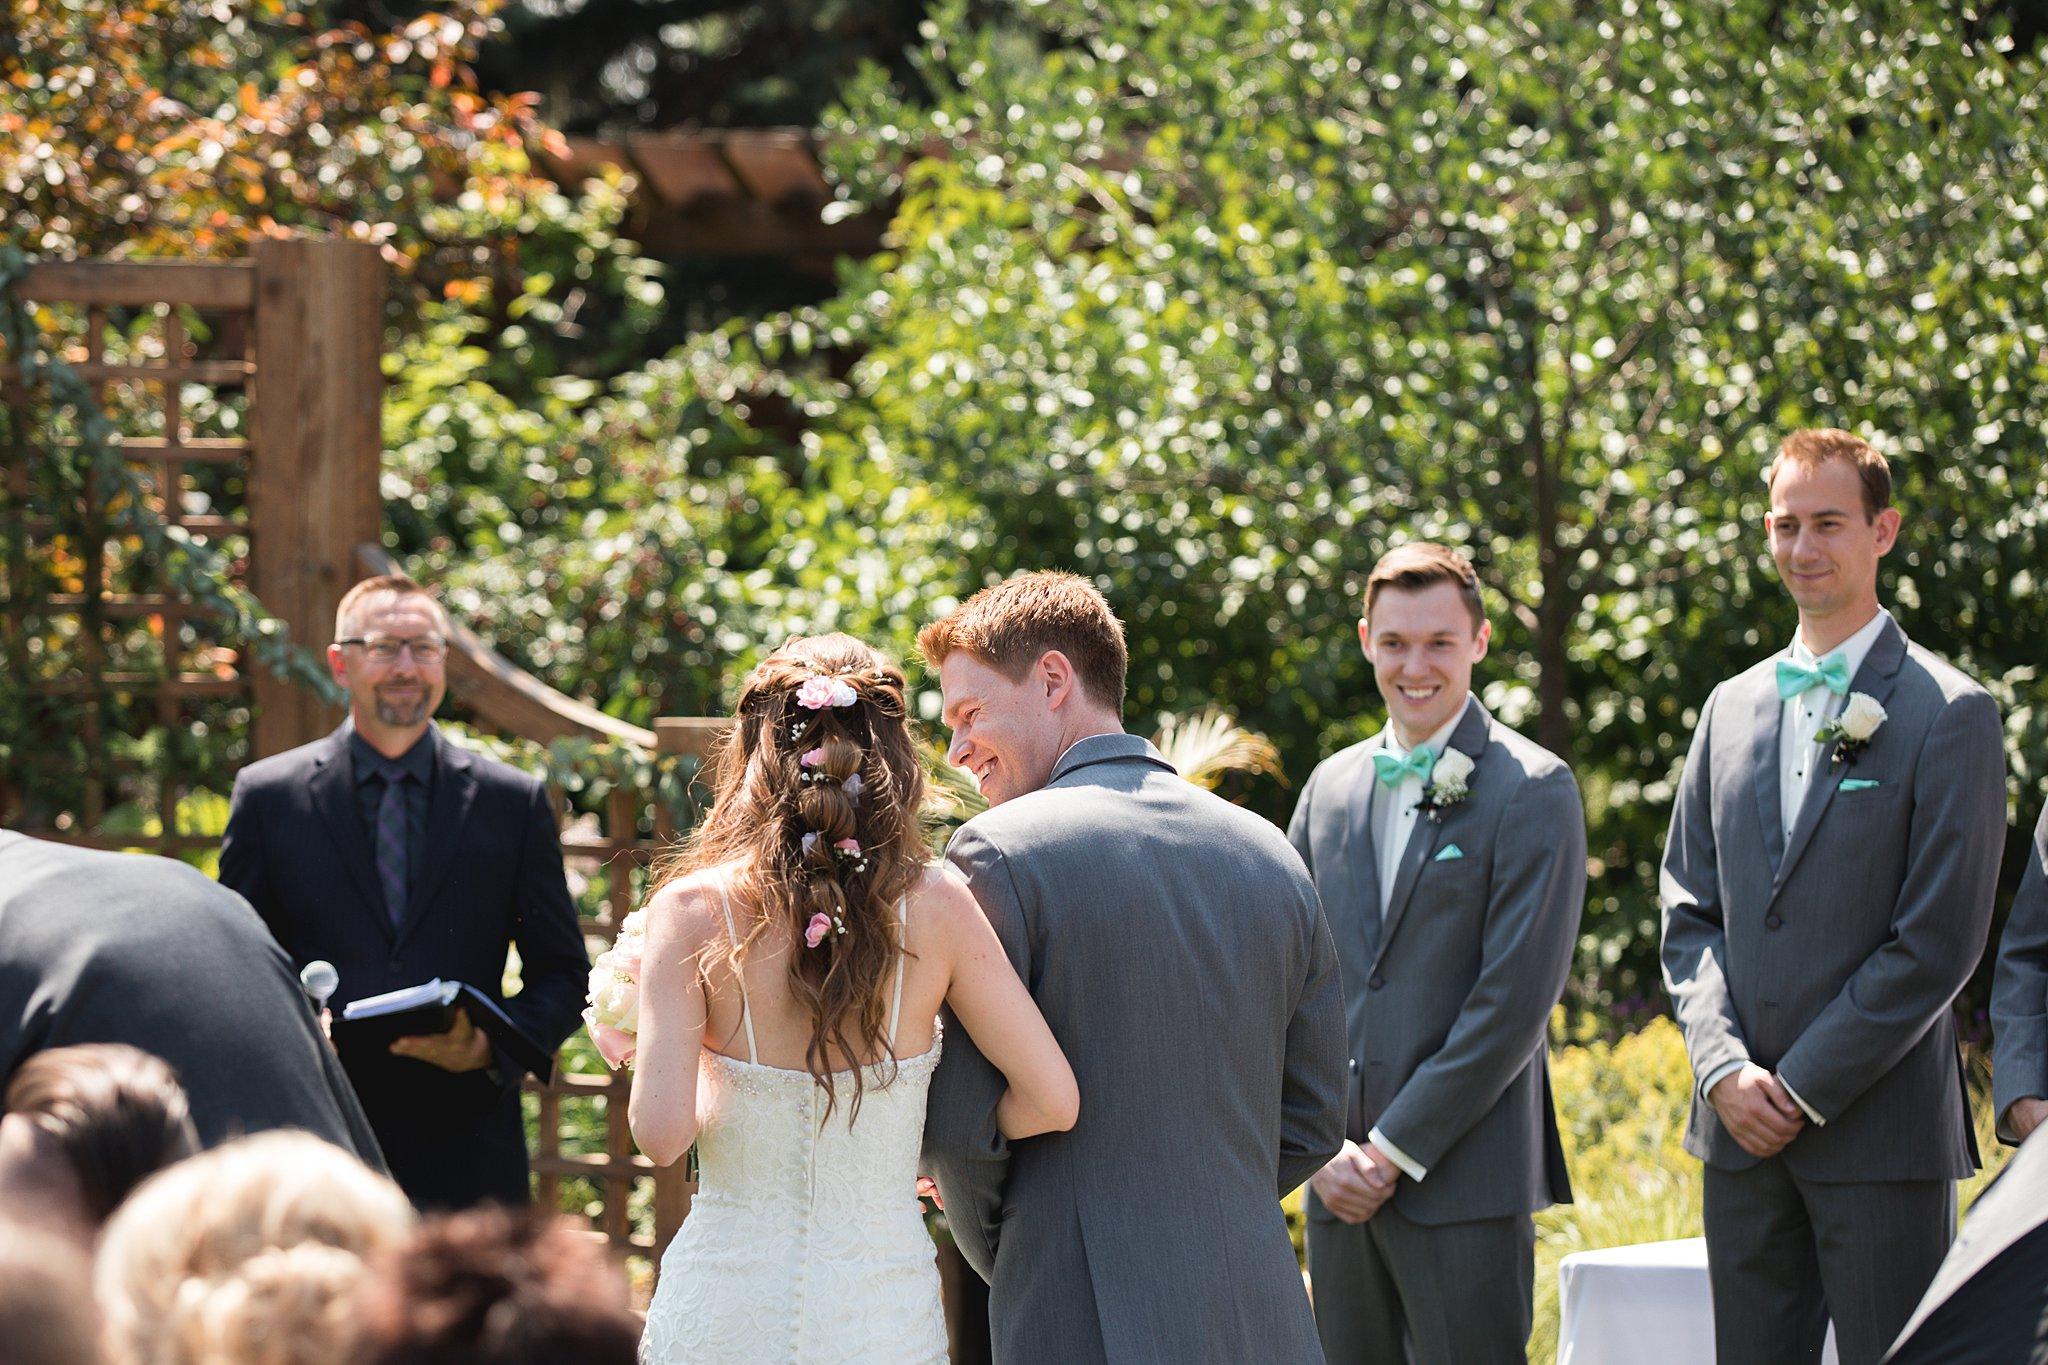 Ashley Daphne Photography Calgary Wedding Couple Family Photographer Calgary Zoo Summer Wedding Outdoor Ceremony_0065.jpg